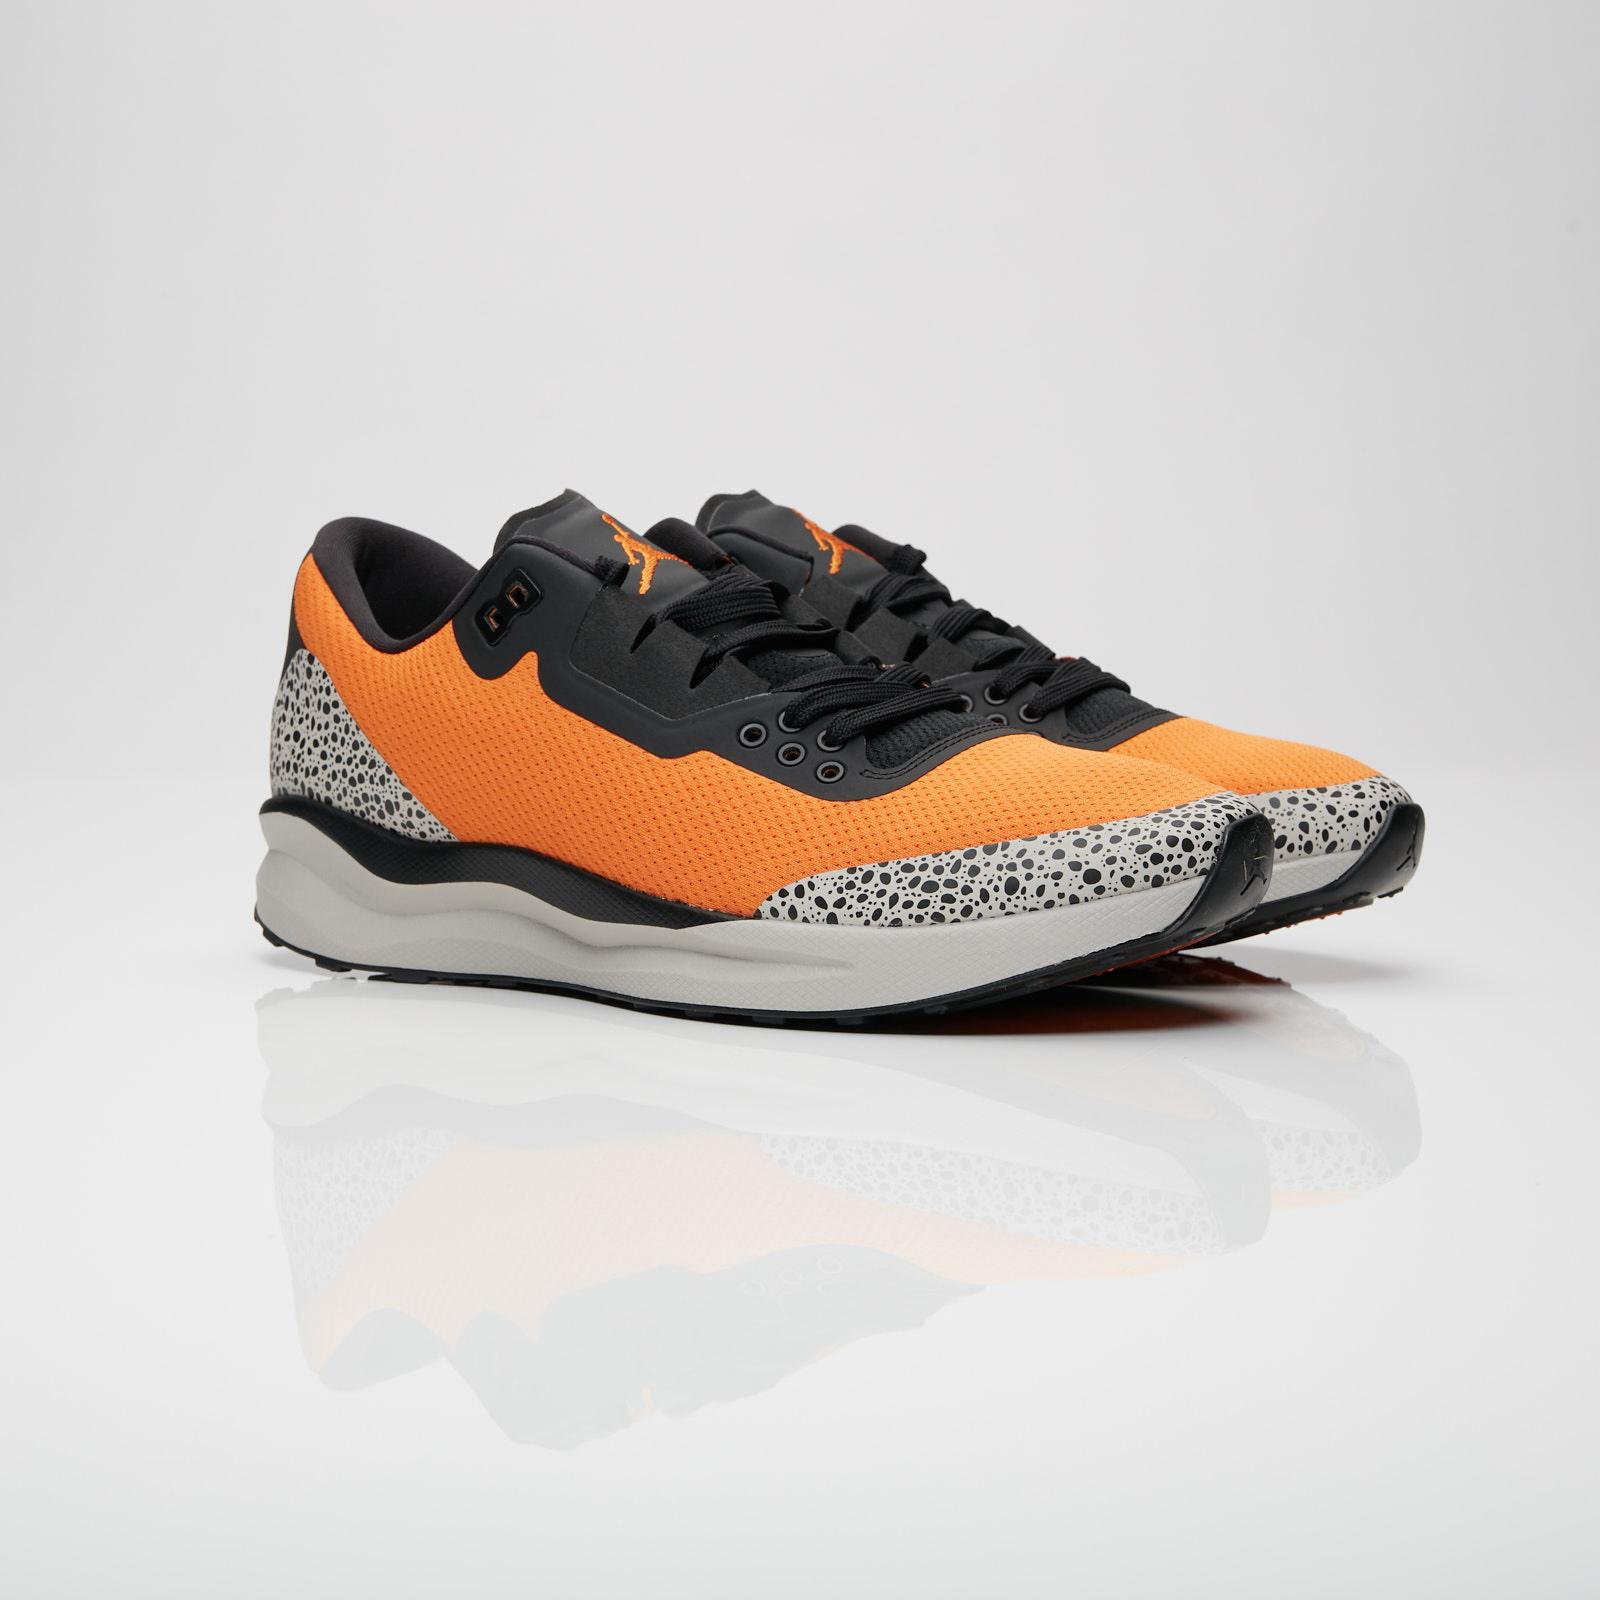 3f888523b27c Jordan Brand Zoom Tenacity 88 - Av5878-800 - Sneakersnstuff ...